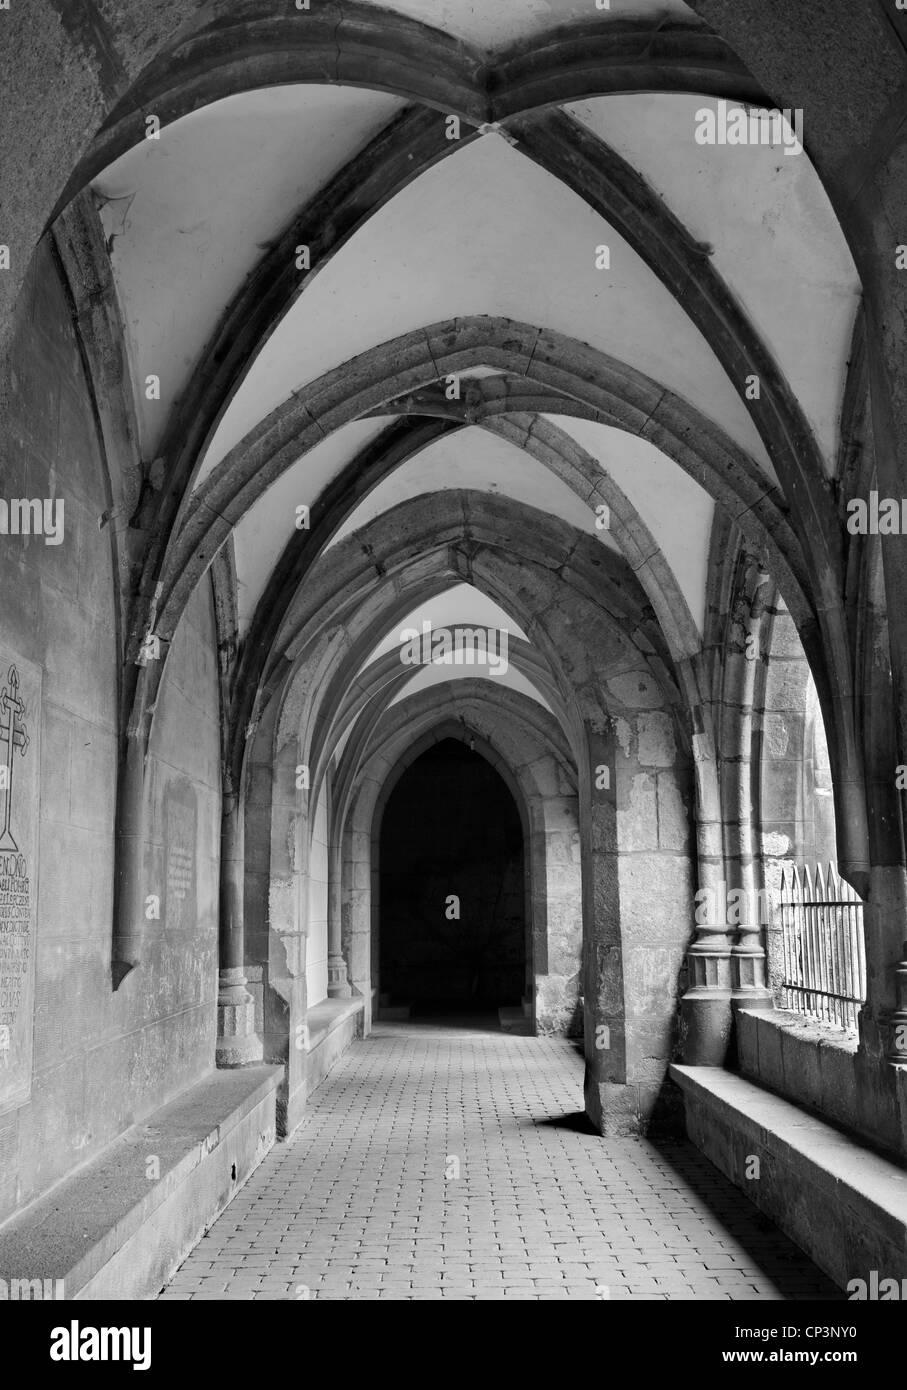 Slovakia - Hronsky Benadik - gothic corridor of atrium - old benedictine cloister - Stock Image